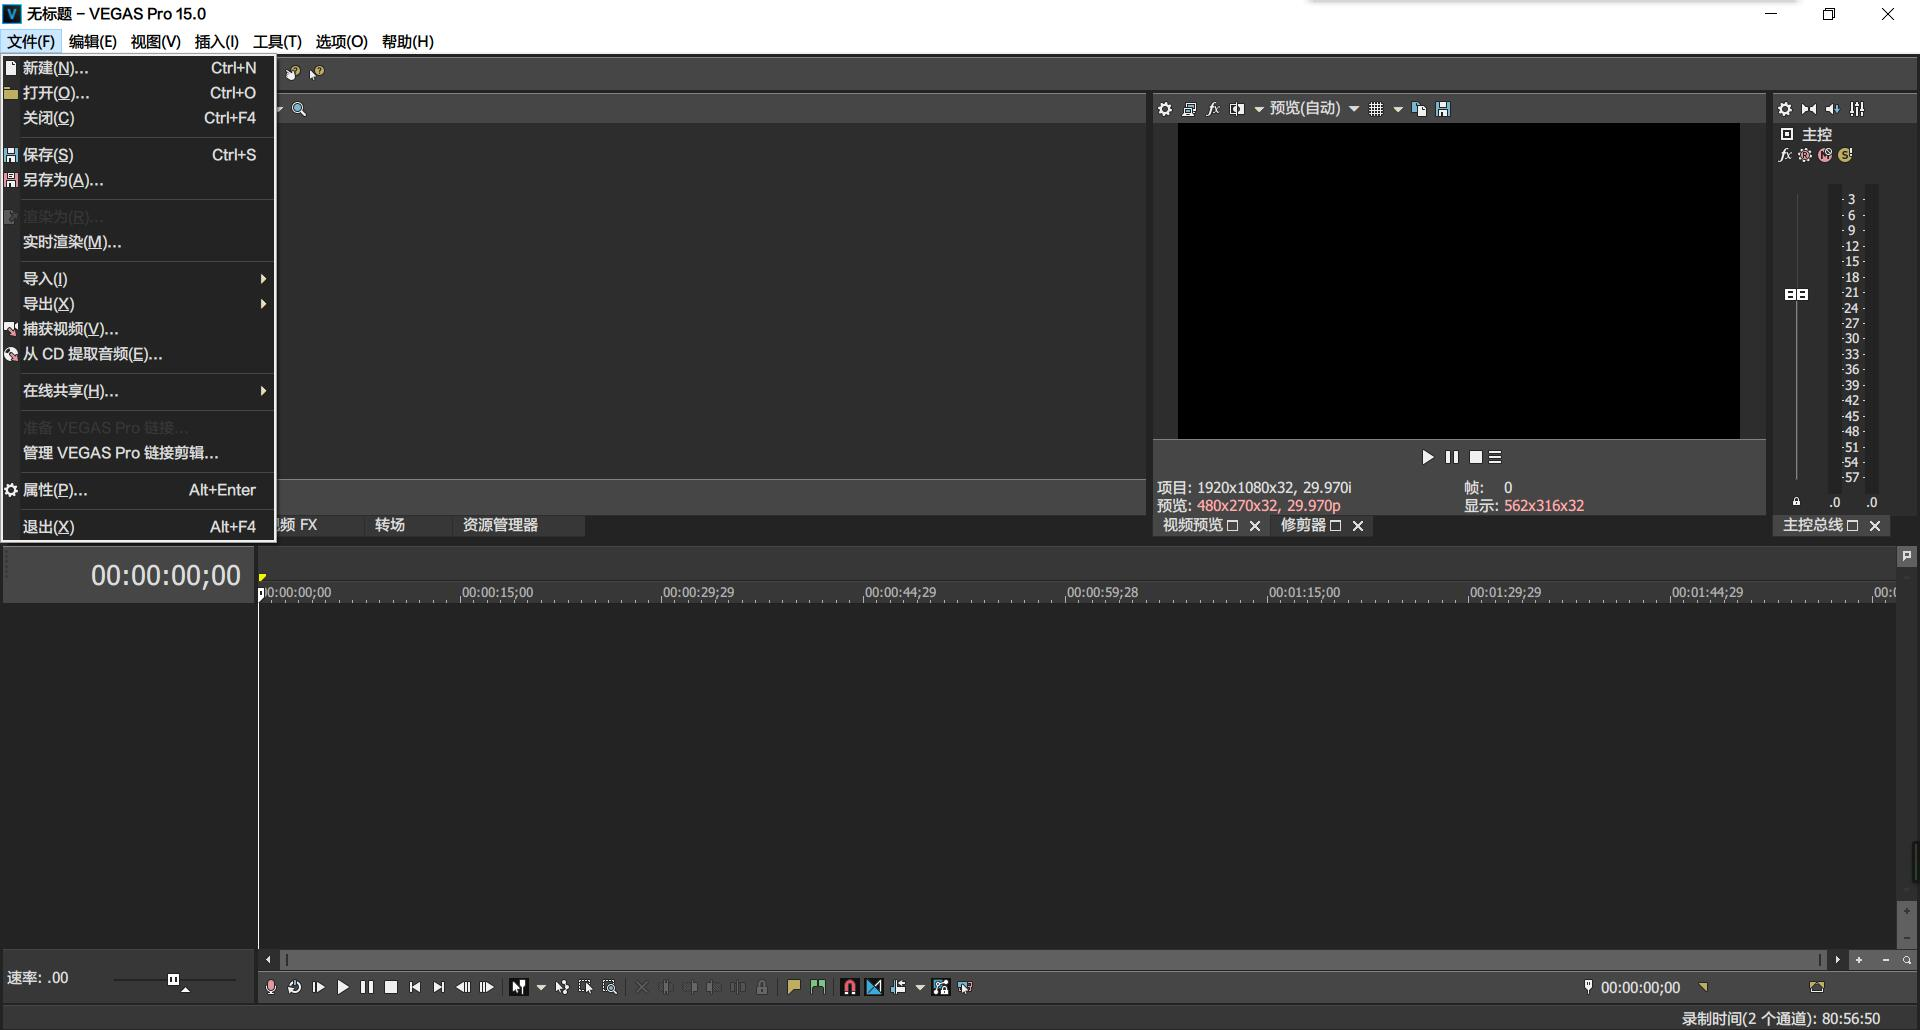 MAGIX Vegas Pro 15.0 Build 177 (x64) 中文破解版(在线安装/离线包)